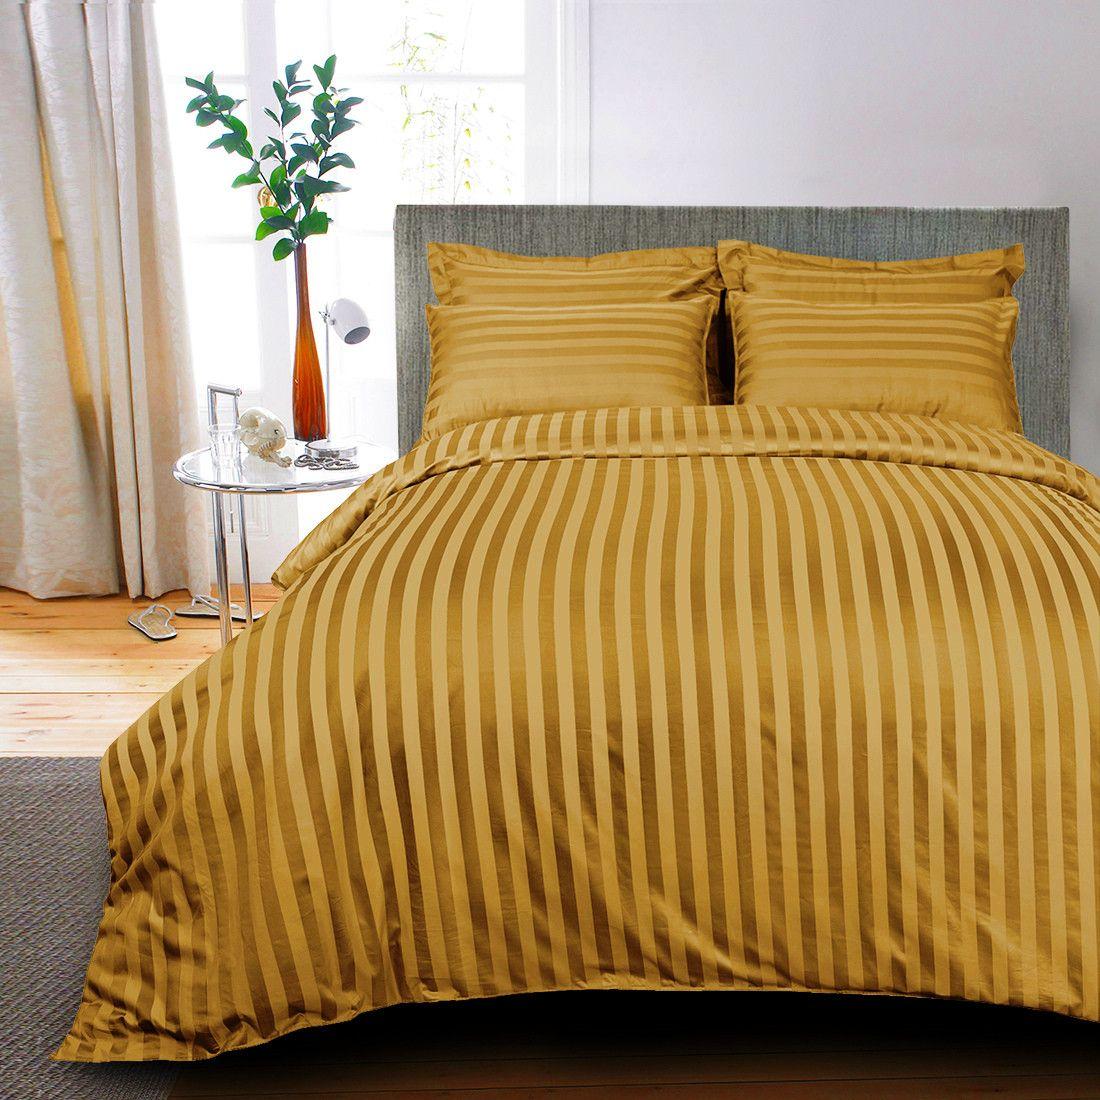 egyptian cotton 400 tc bed sheet striped white - Striped Sheets